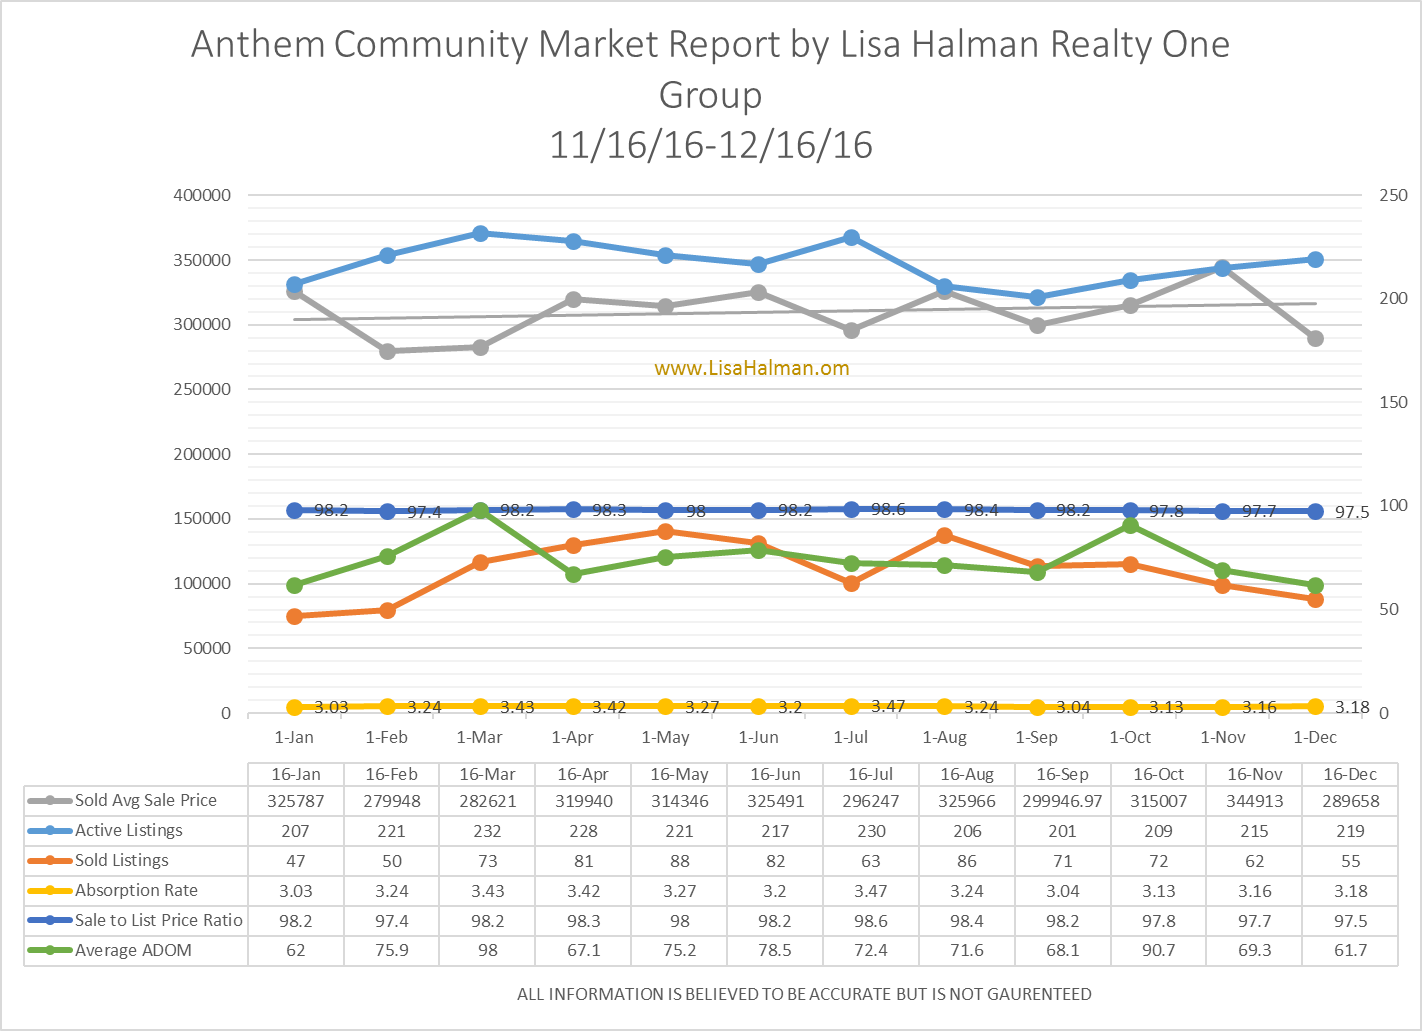 Anthem Community Market Report December 2016